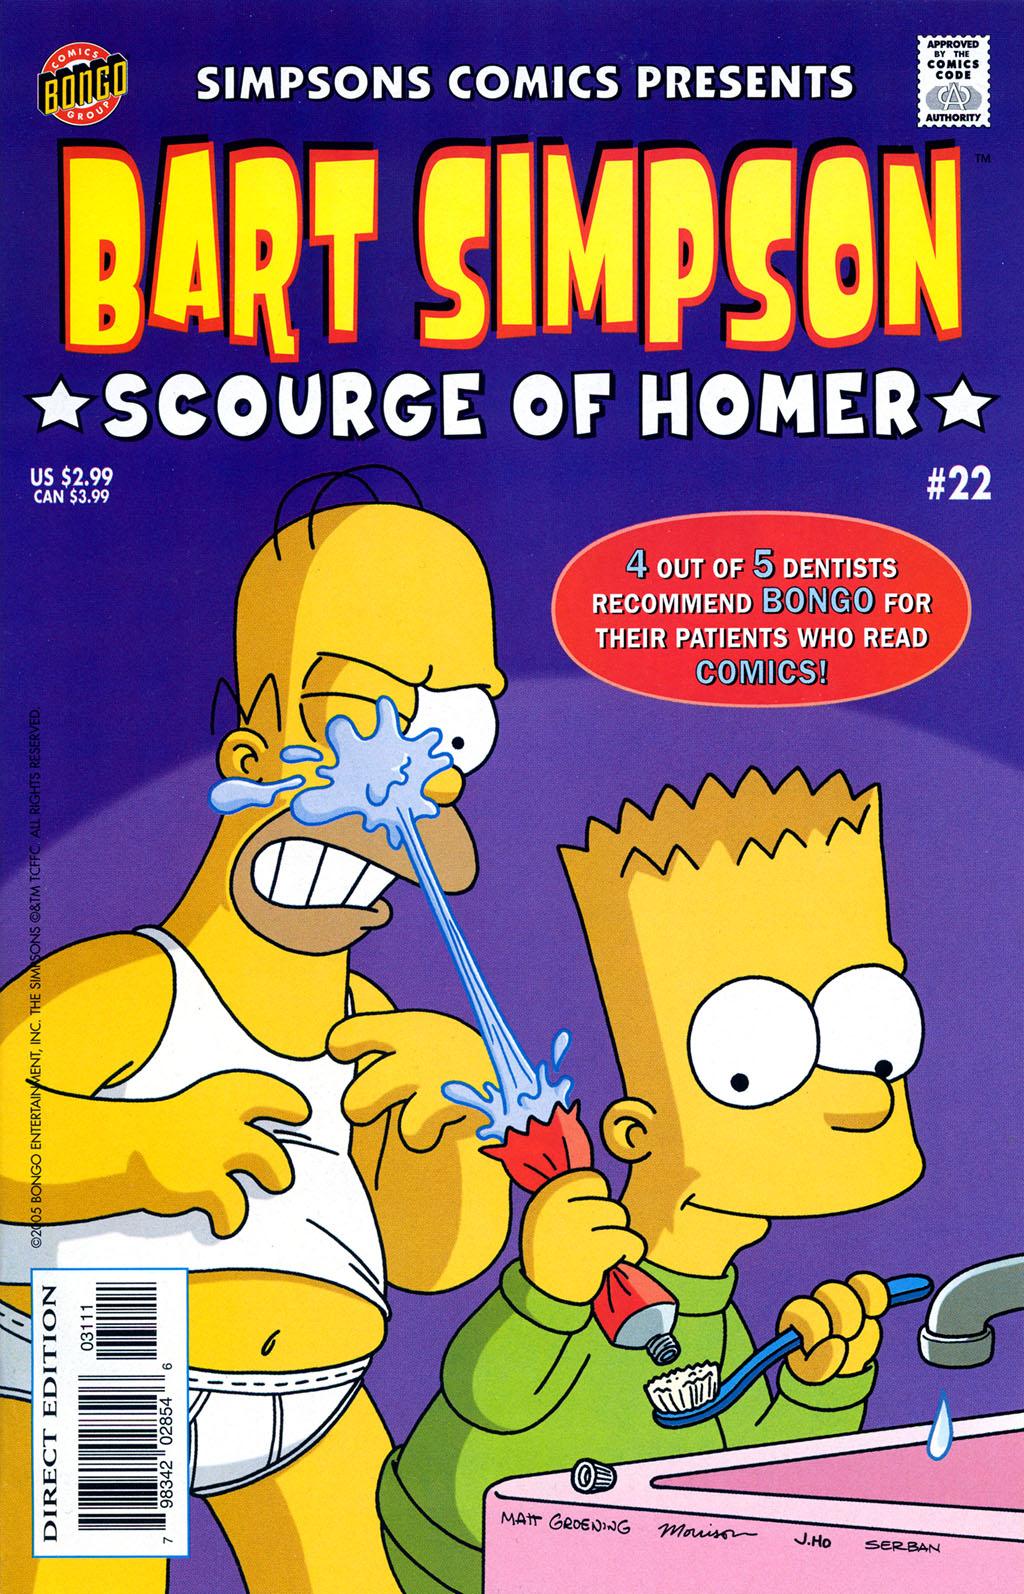 Read online Simpsons Comics Presents Bart Simpson comic -  Issue #22 - 1